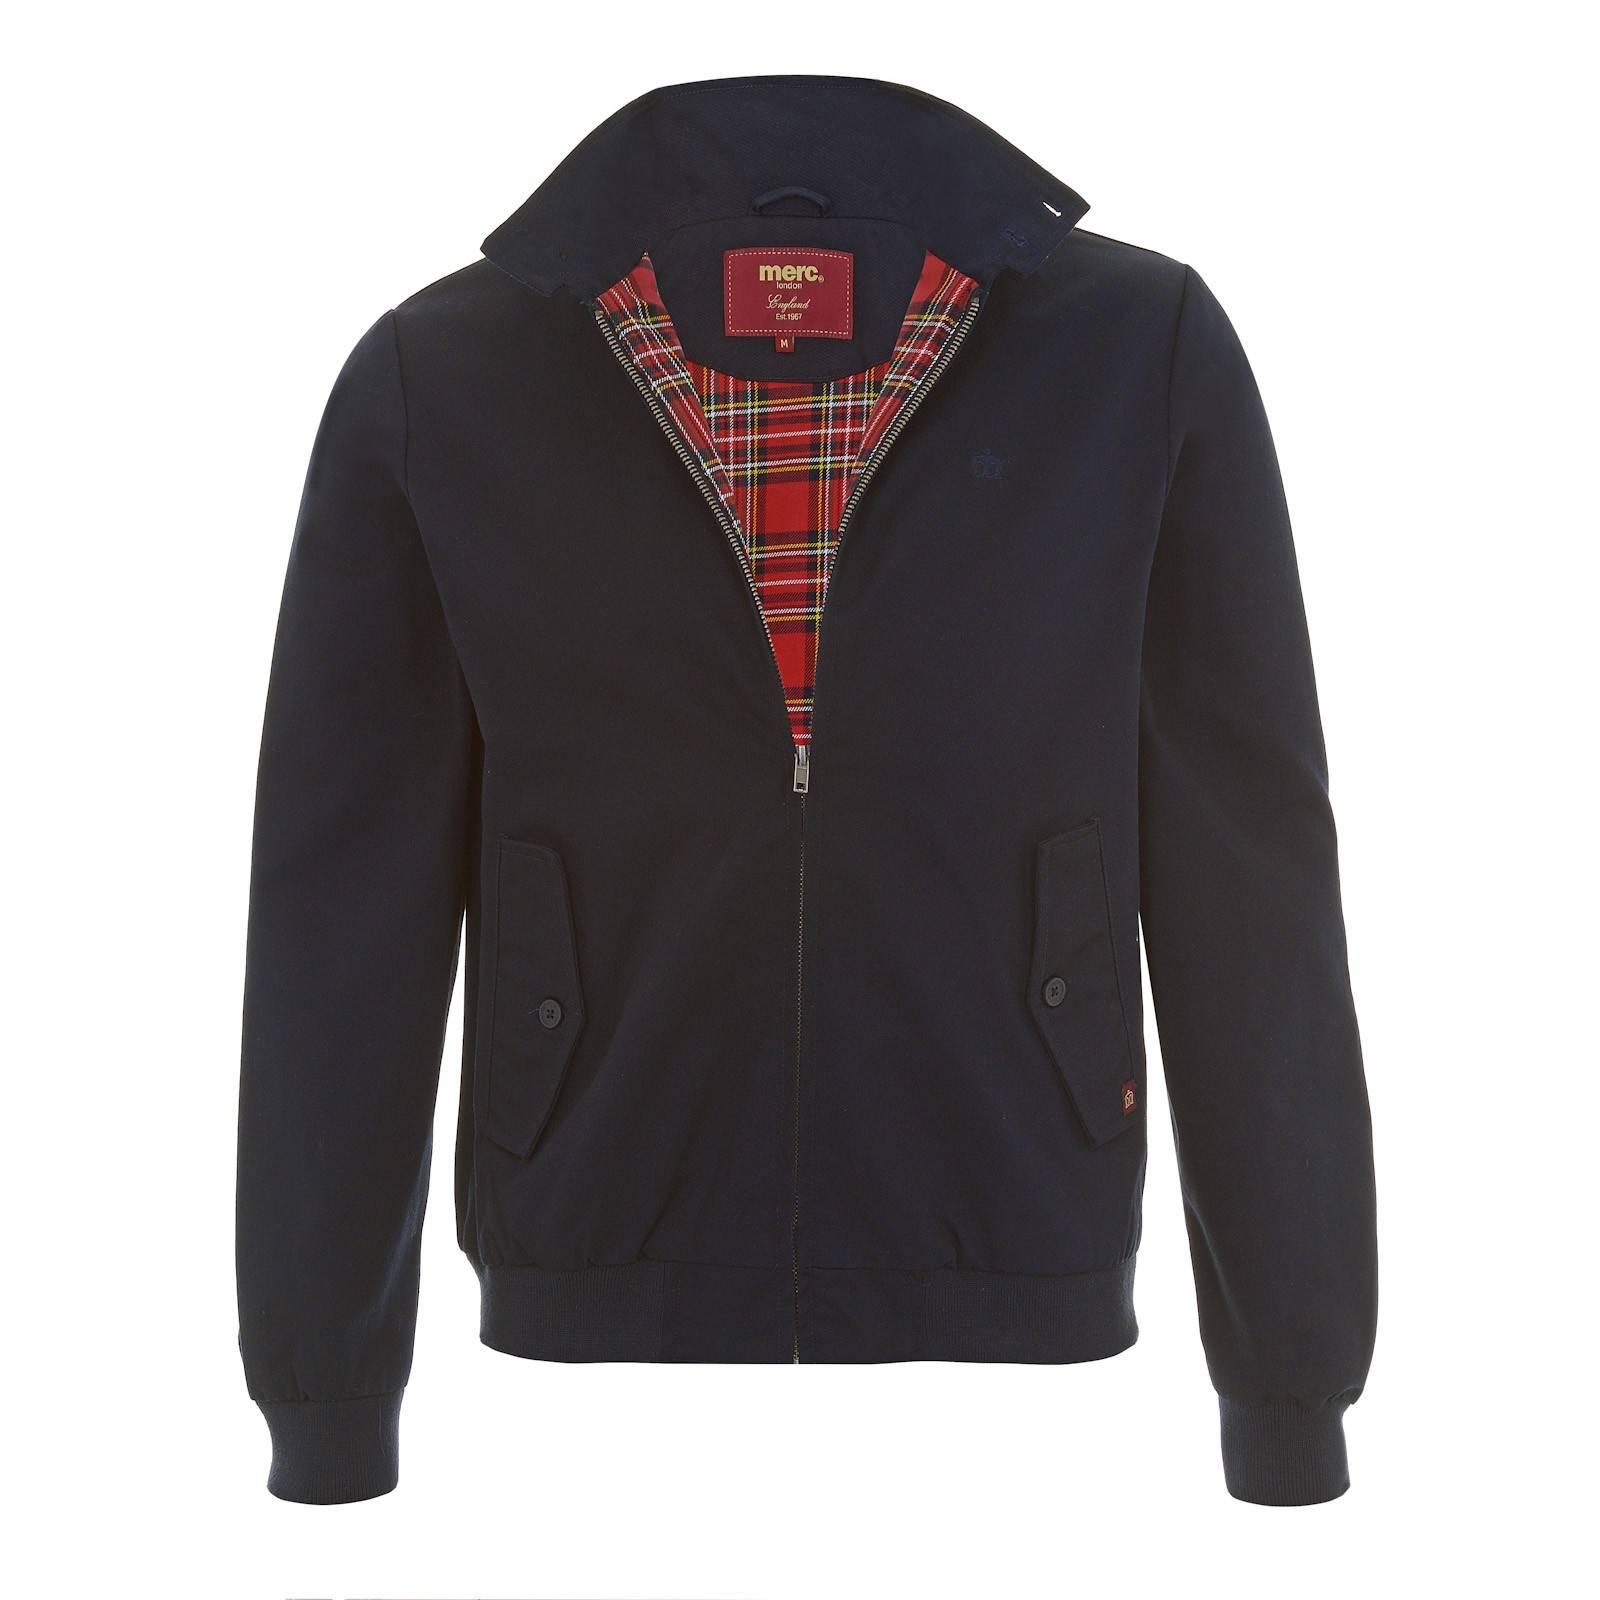 Куртка HarringtonCORE<br><br><br>Артикул: 1104106<br>Материал: 60% хлопок, 40% полиэстер / Подкладка 100% хлопок<br>Цвет: синий<br>Пол: Мужской